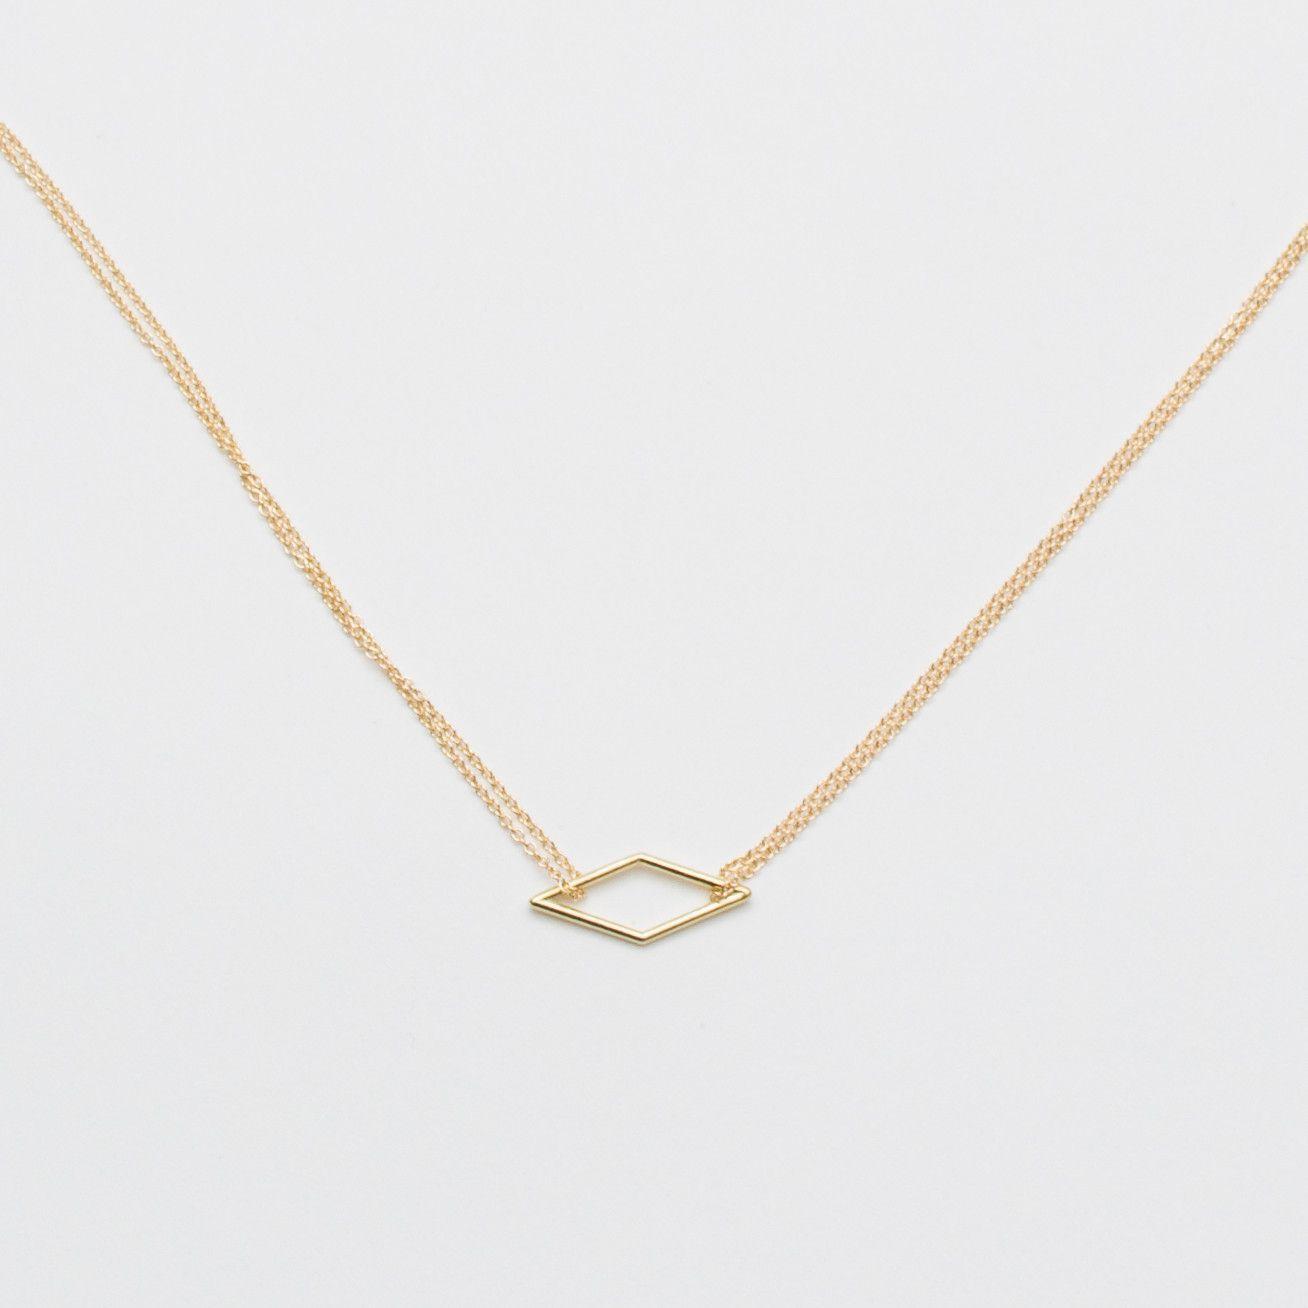 Adina reyter diamond necklace gold products pinterest